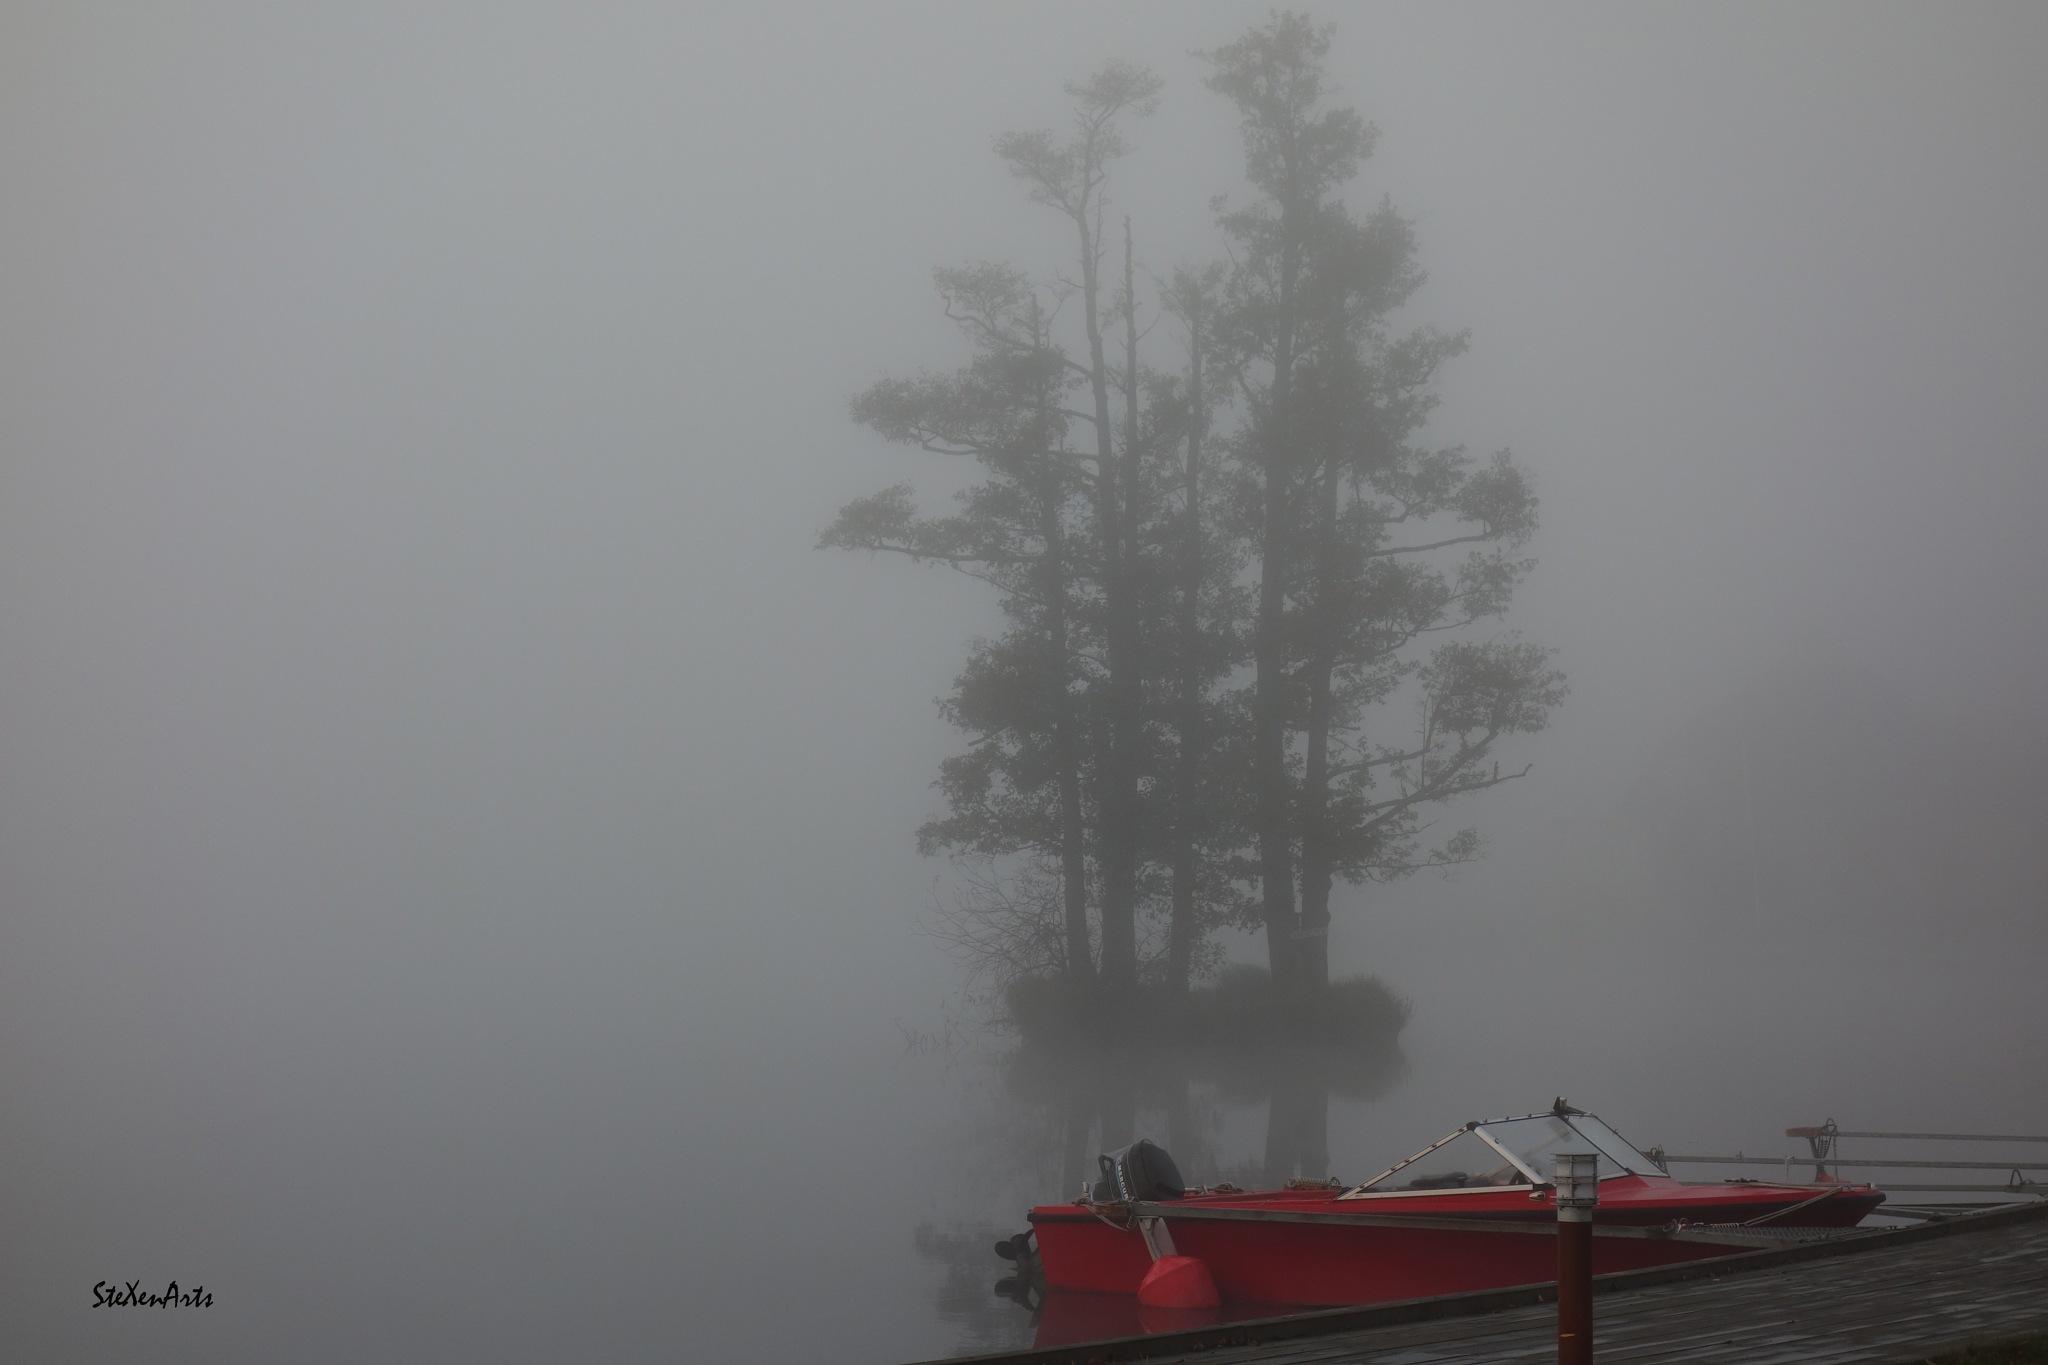 found in the fog by Sanna